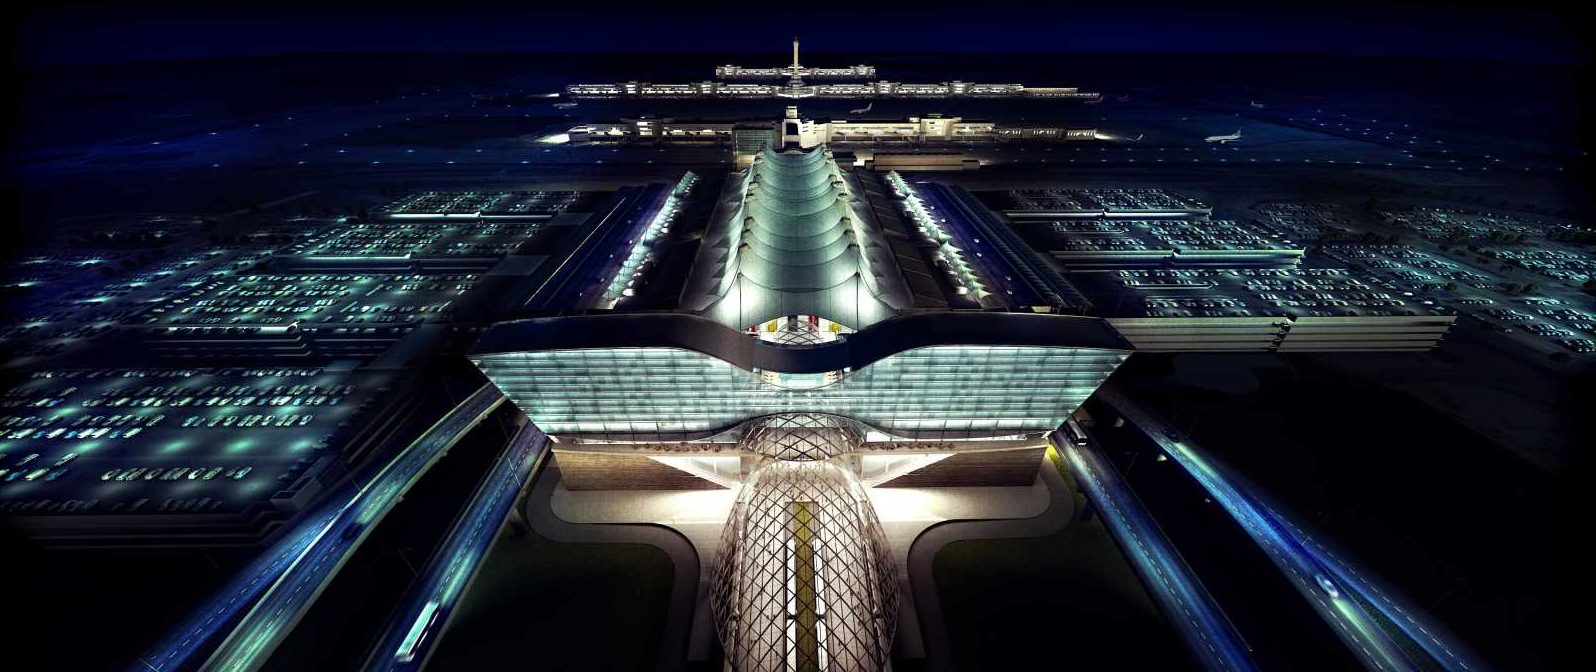 denver-international-airport-dia-shuttle-transportation-limo-executive-car-corporate-limousine-service